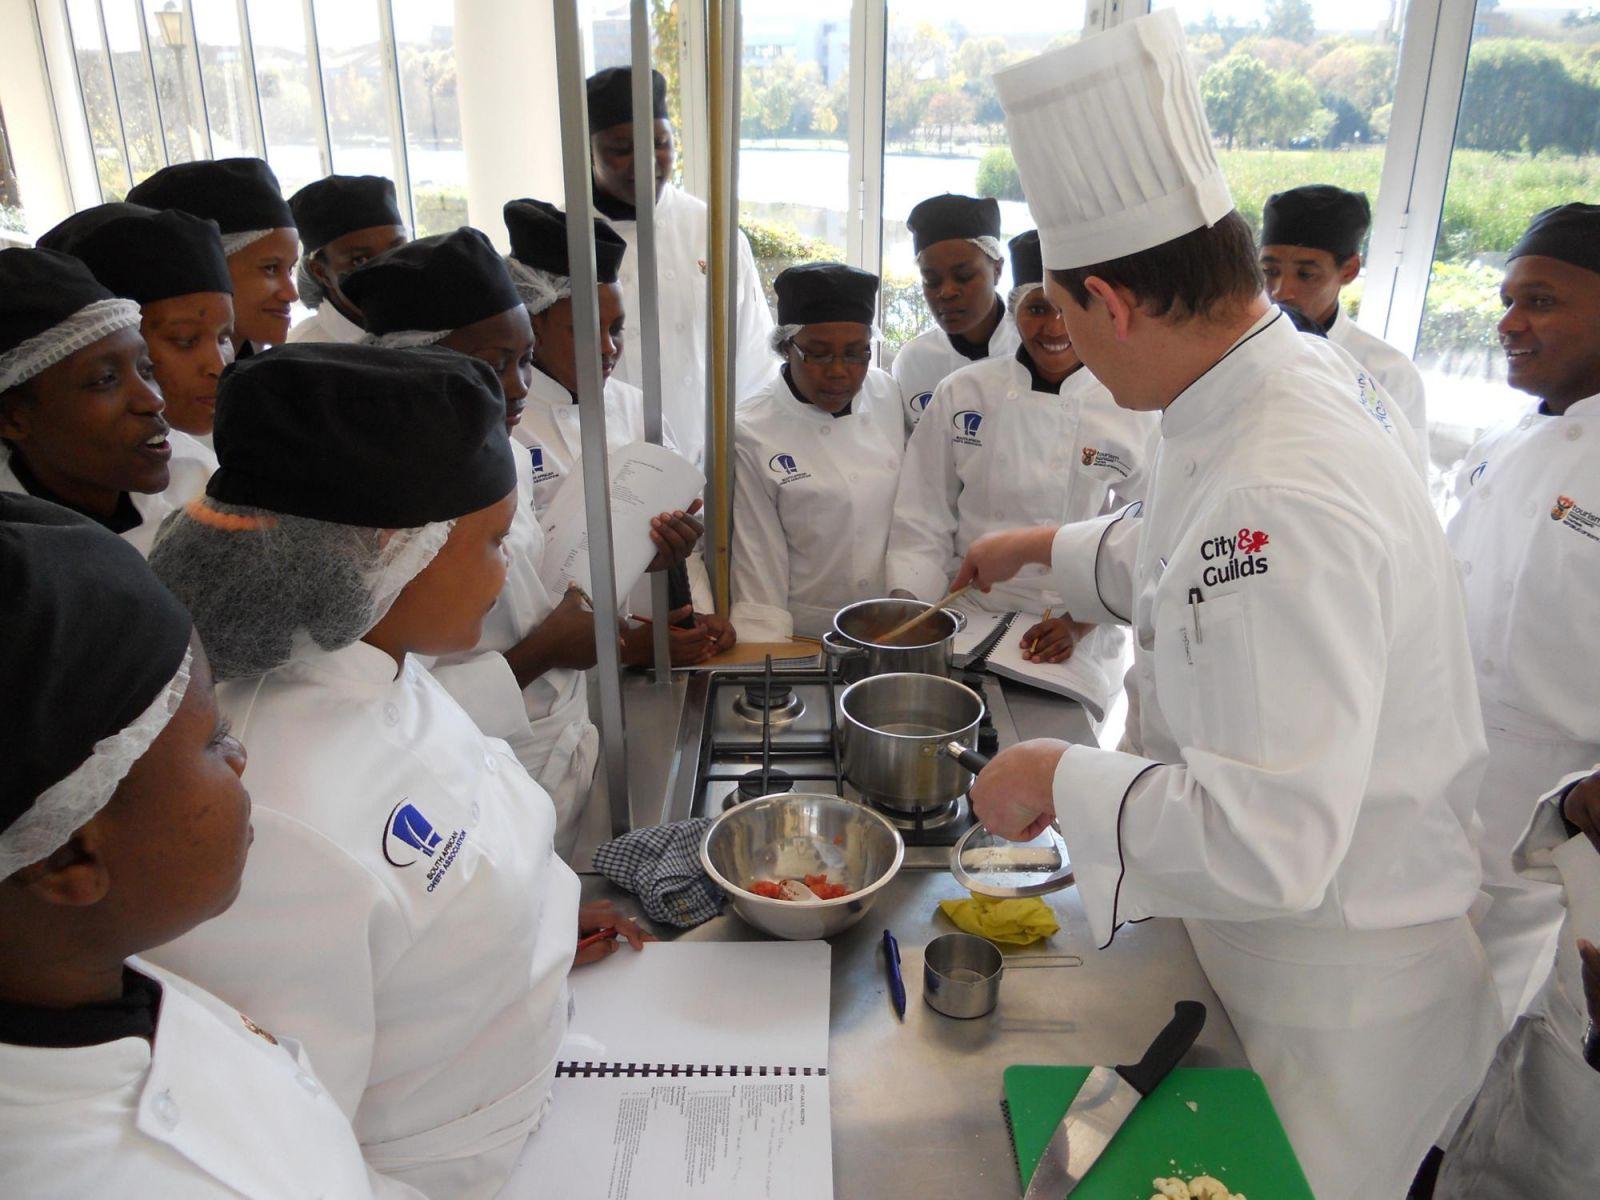 African Chefs